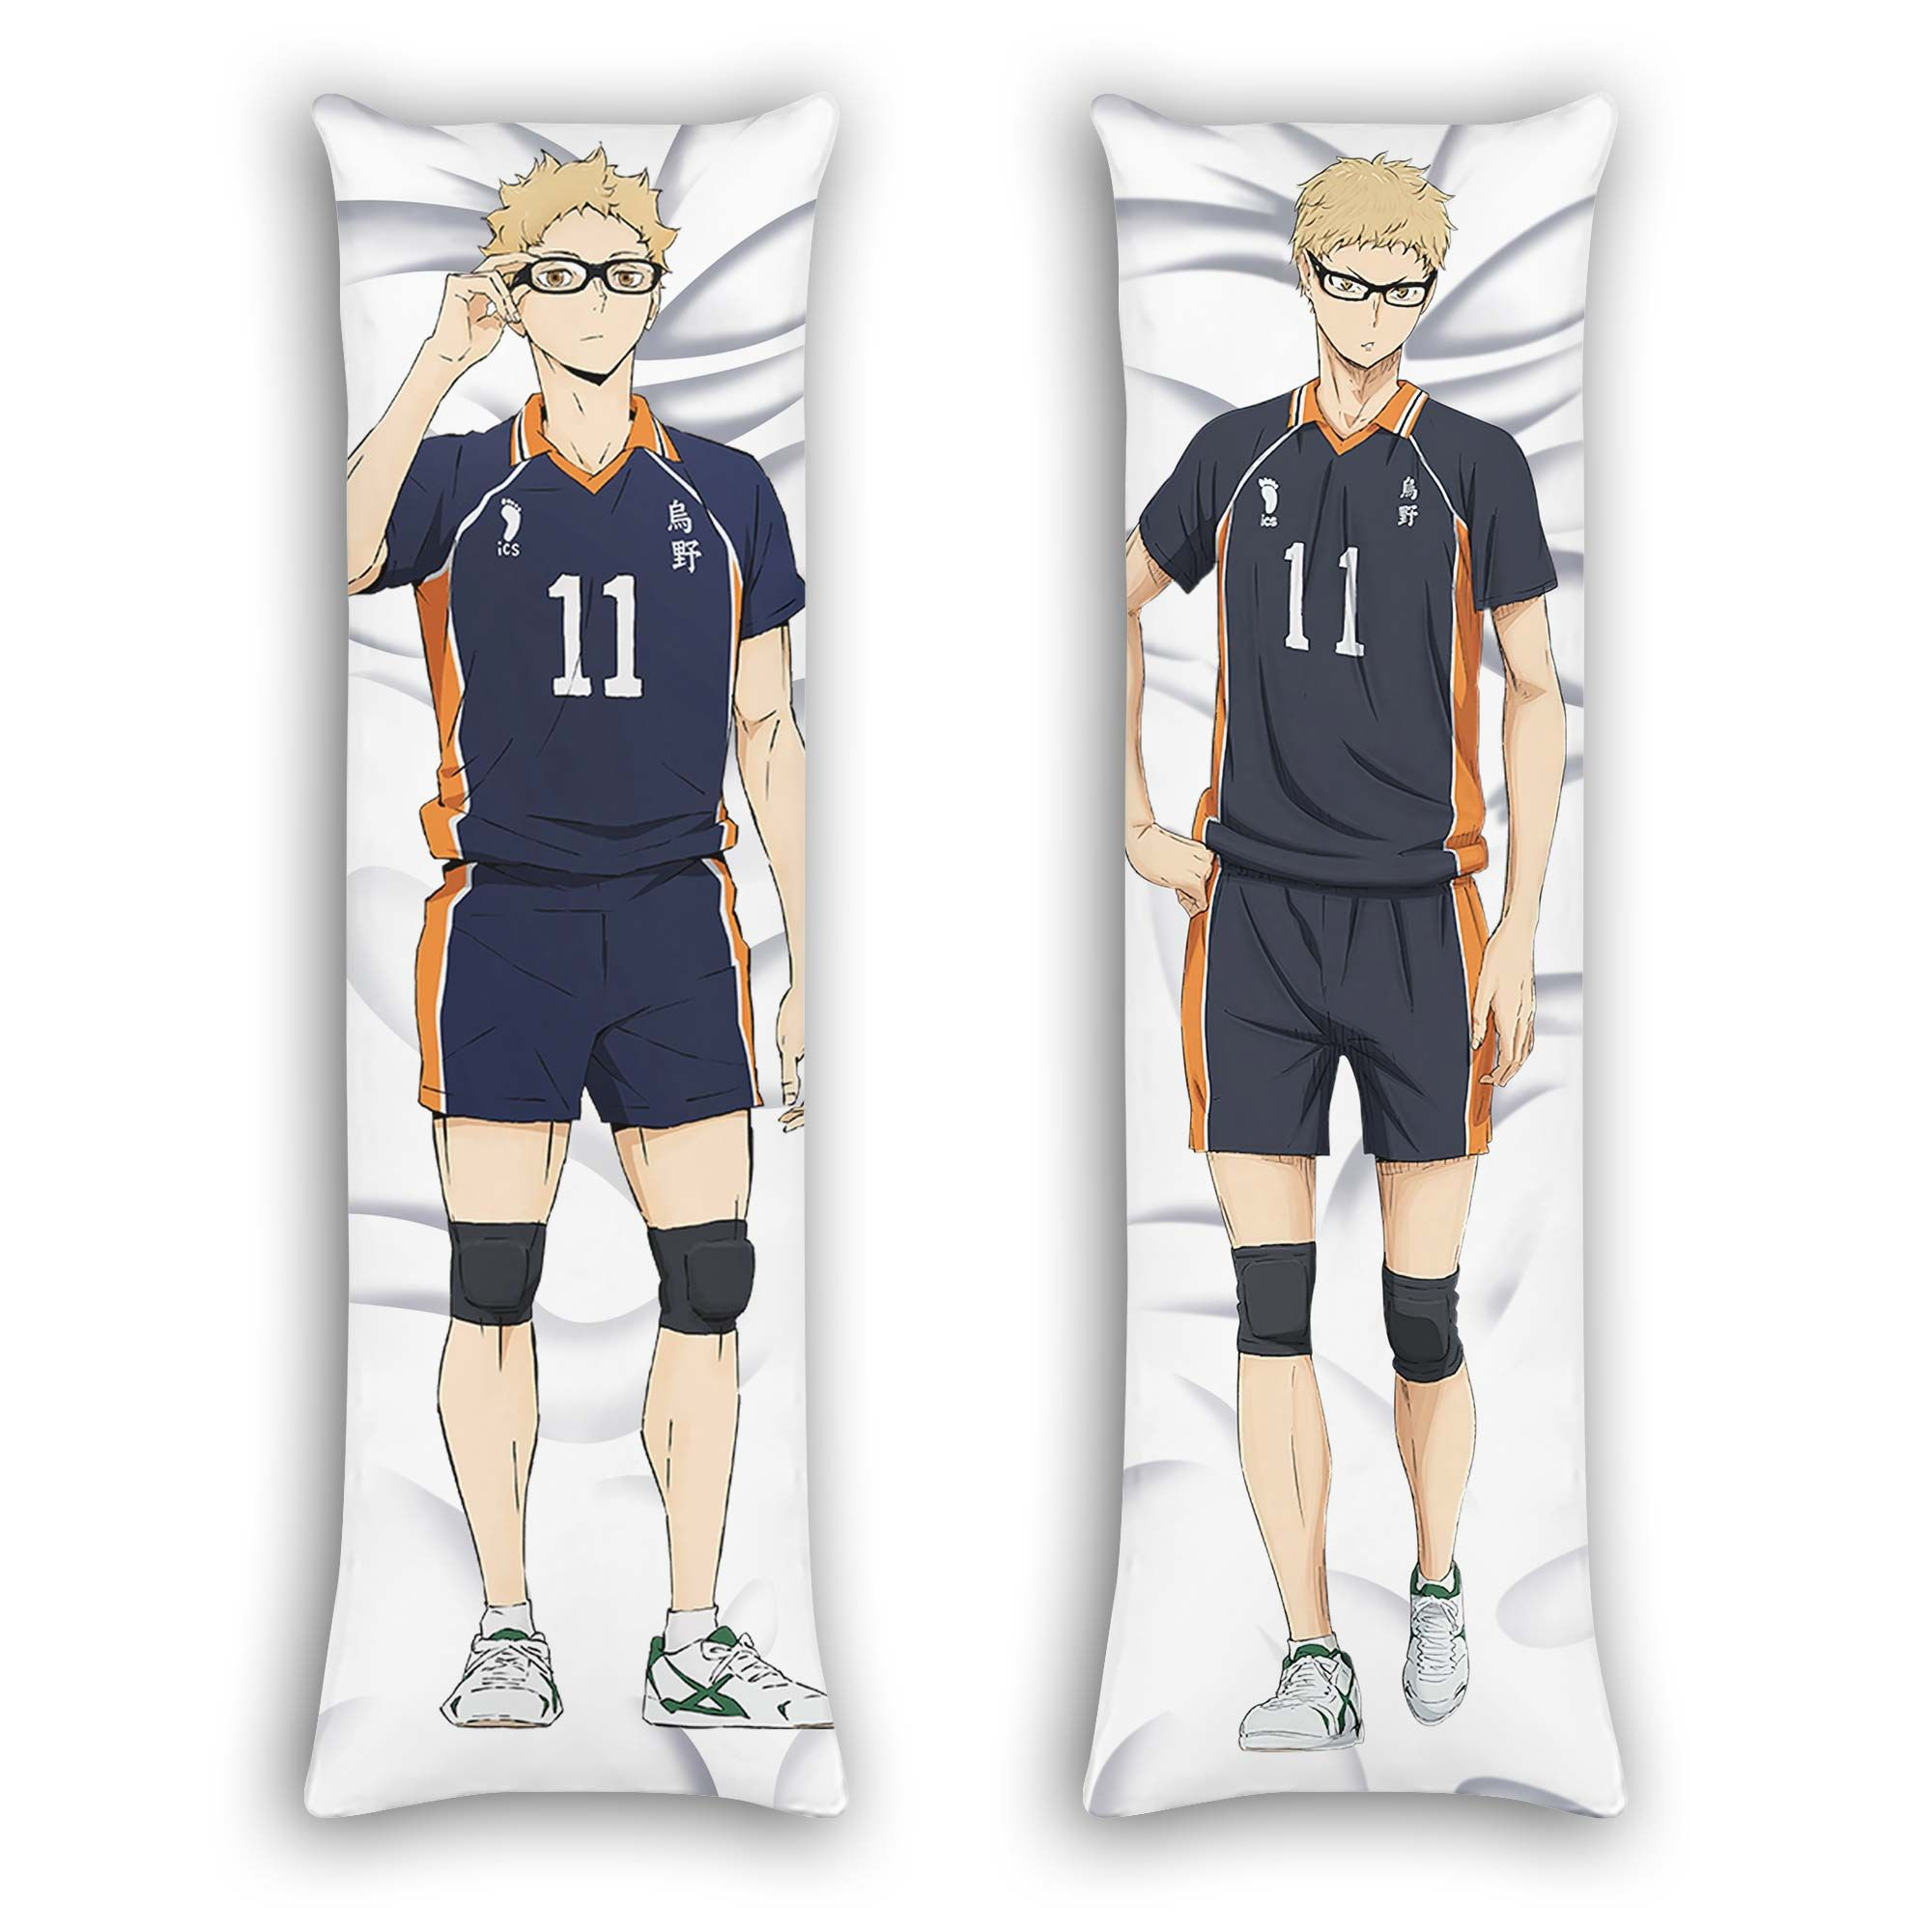 Kei Tsukishima Body Pillow Cover Custom Haikyuu Anime Gifts Official Merch GO0110